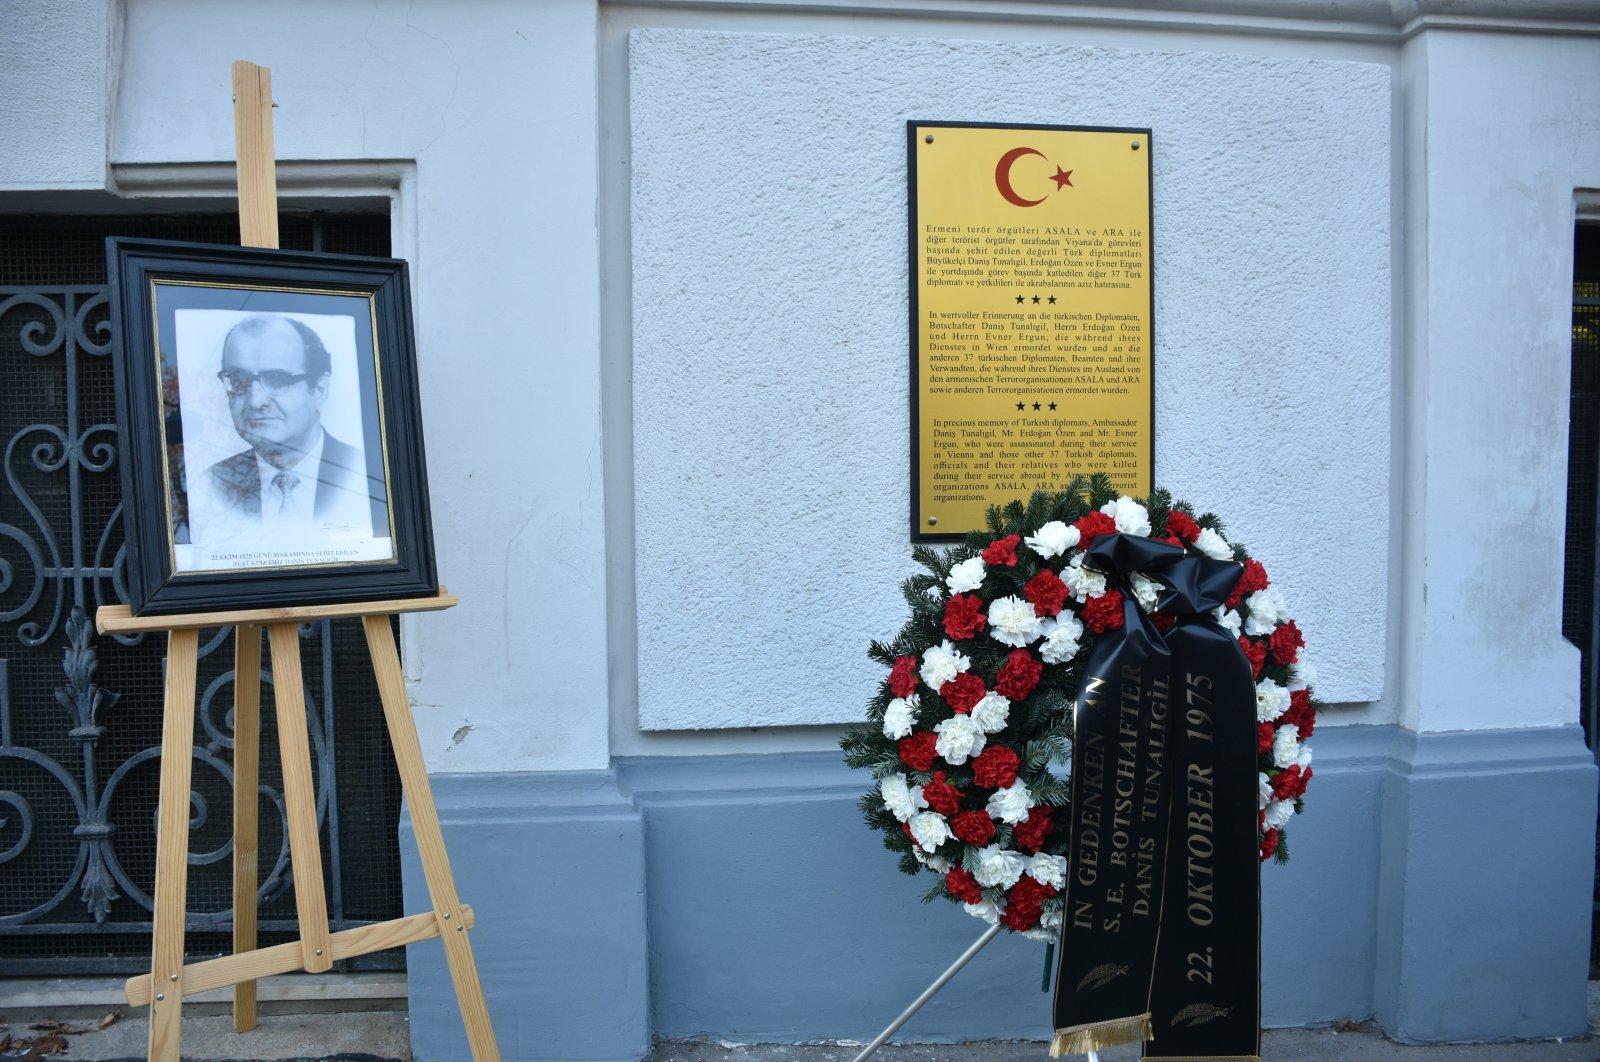 Former Turkish Ambassador to Vienna Danış Tunalıgil, who was killed by Armenian terrorist groups, is remembered at the Turkish Embassy in Vienna, Oct. 22, 2020. (AA)